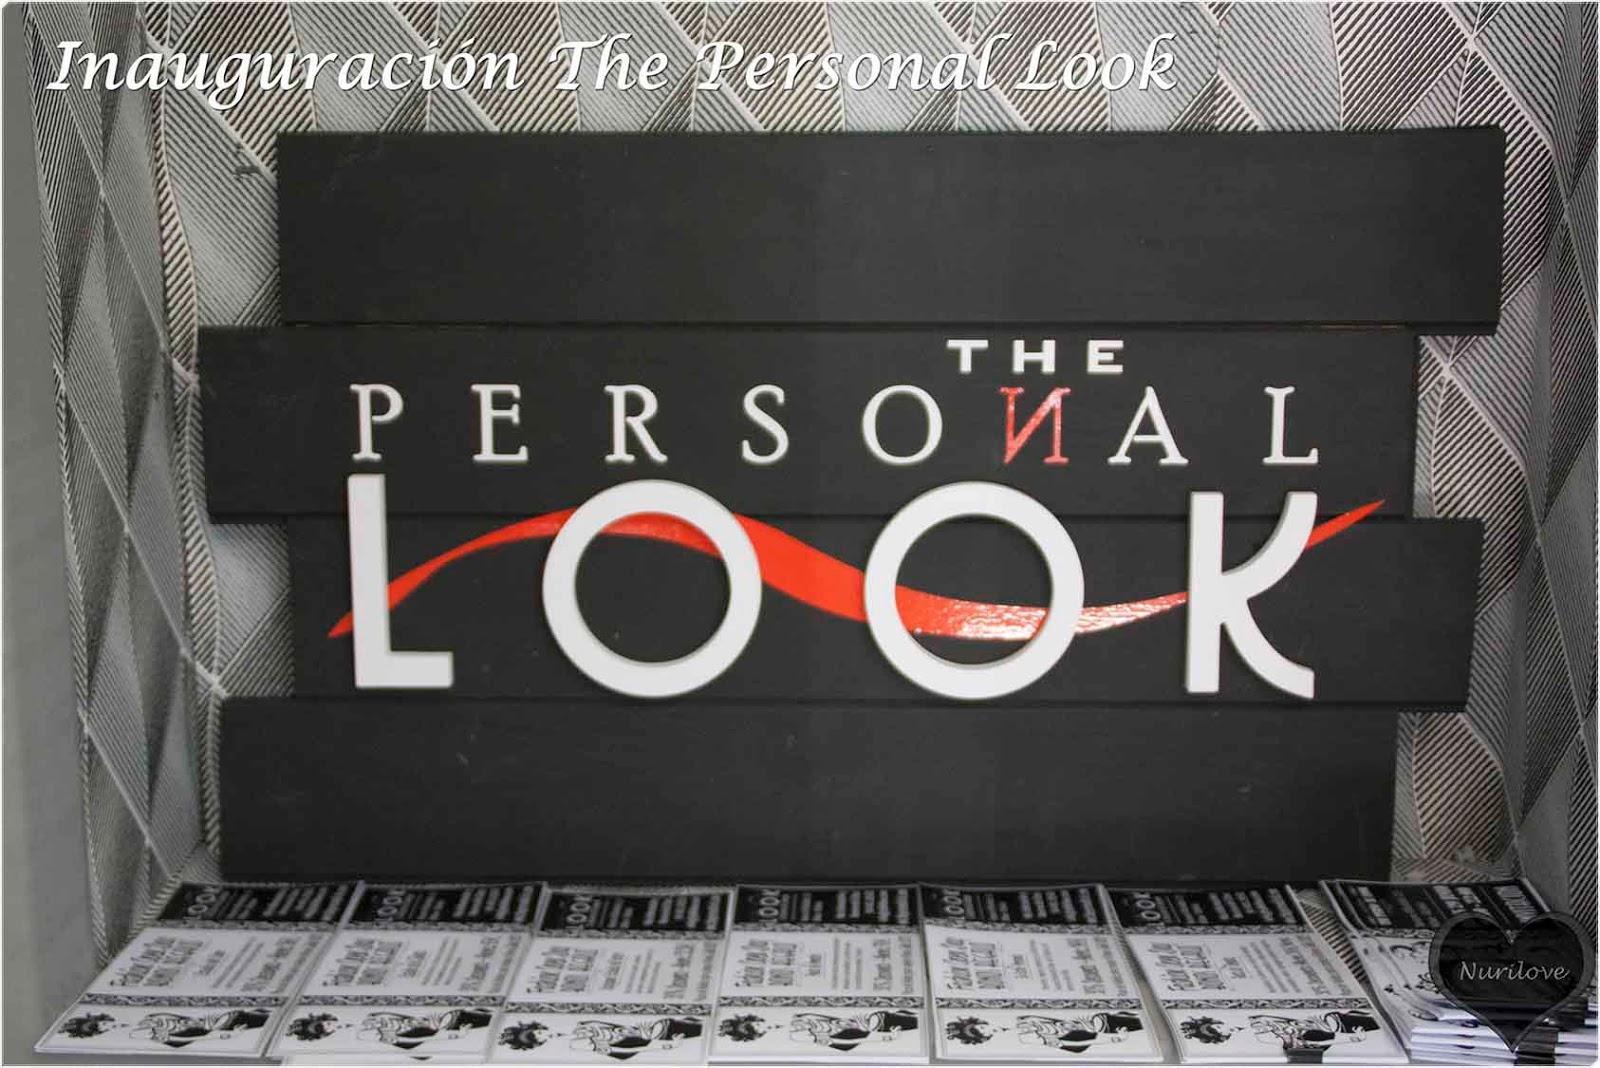 inauguracion de The Personal Look, un centro de Personal assistant en Bilbao que aun sigue